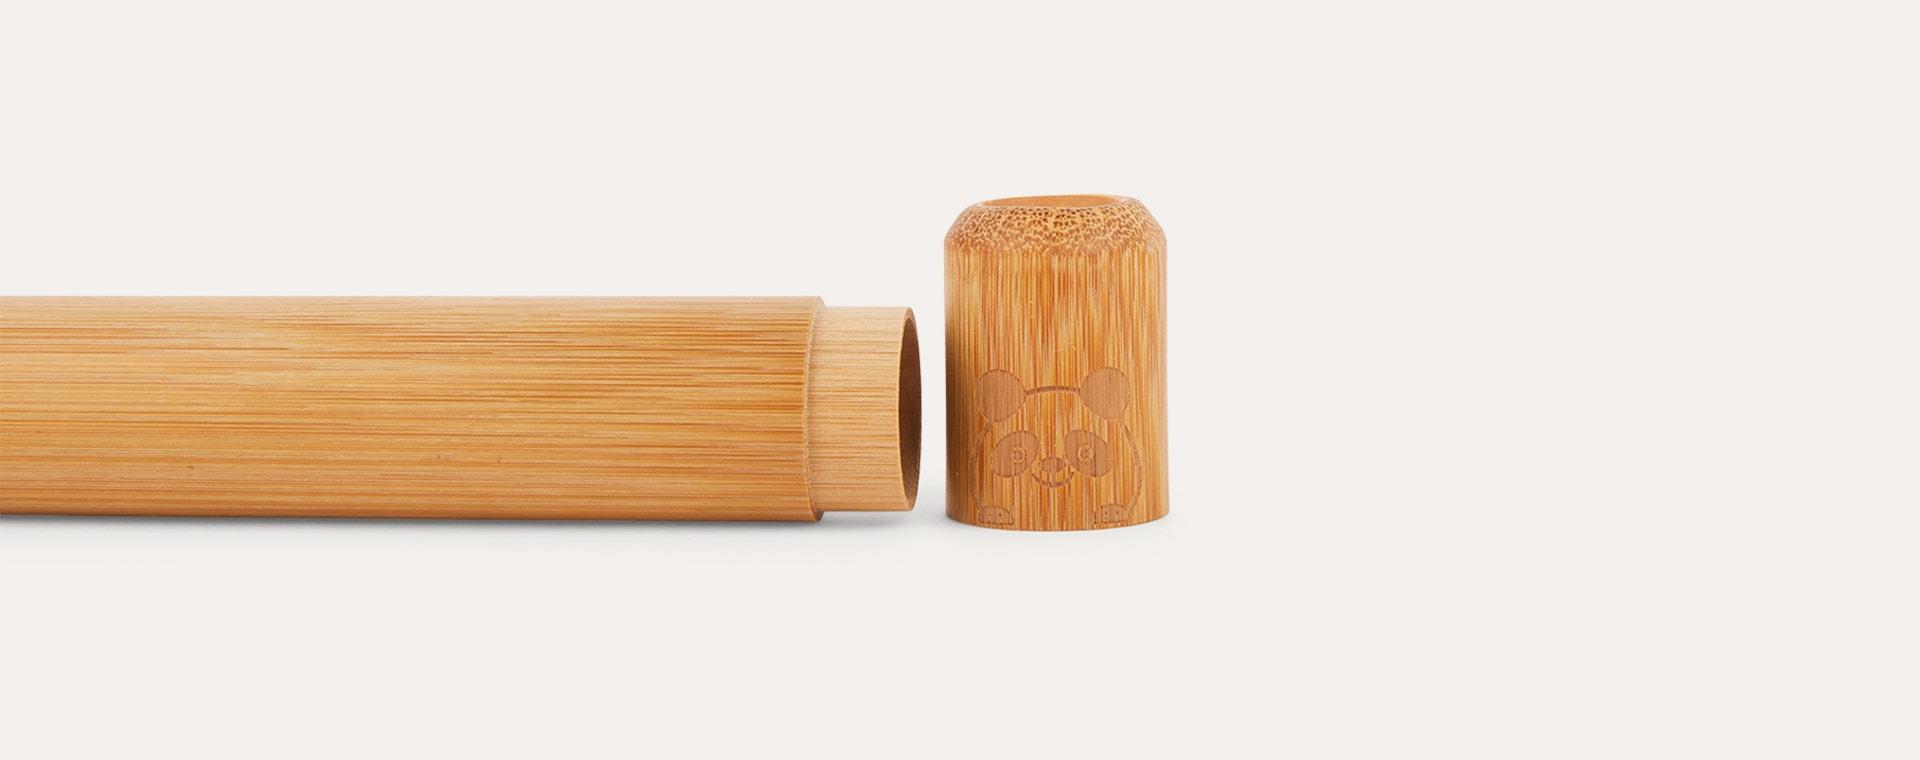 Bamboo Wild & Stone Bamboo Toothbrush Travel Case